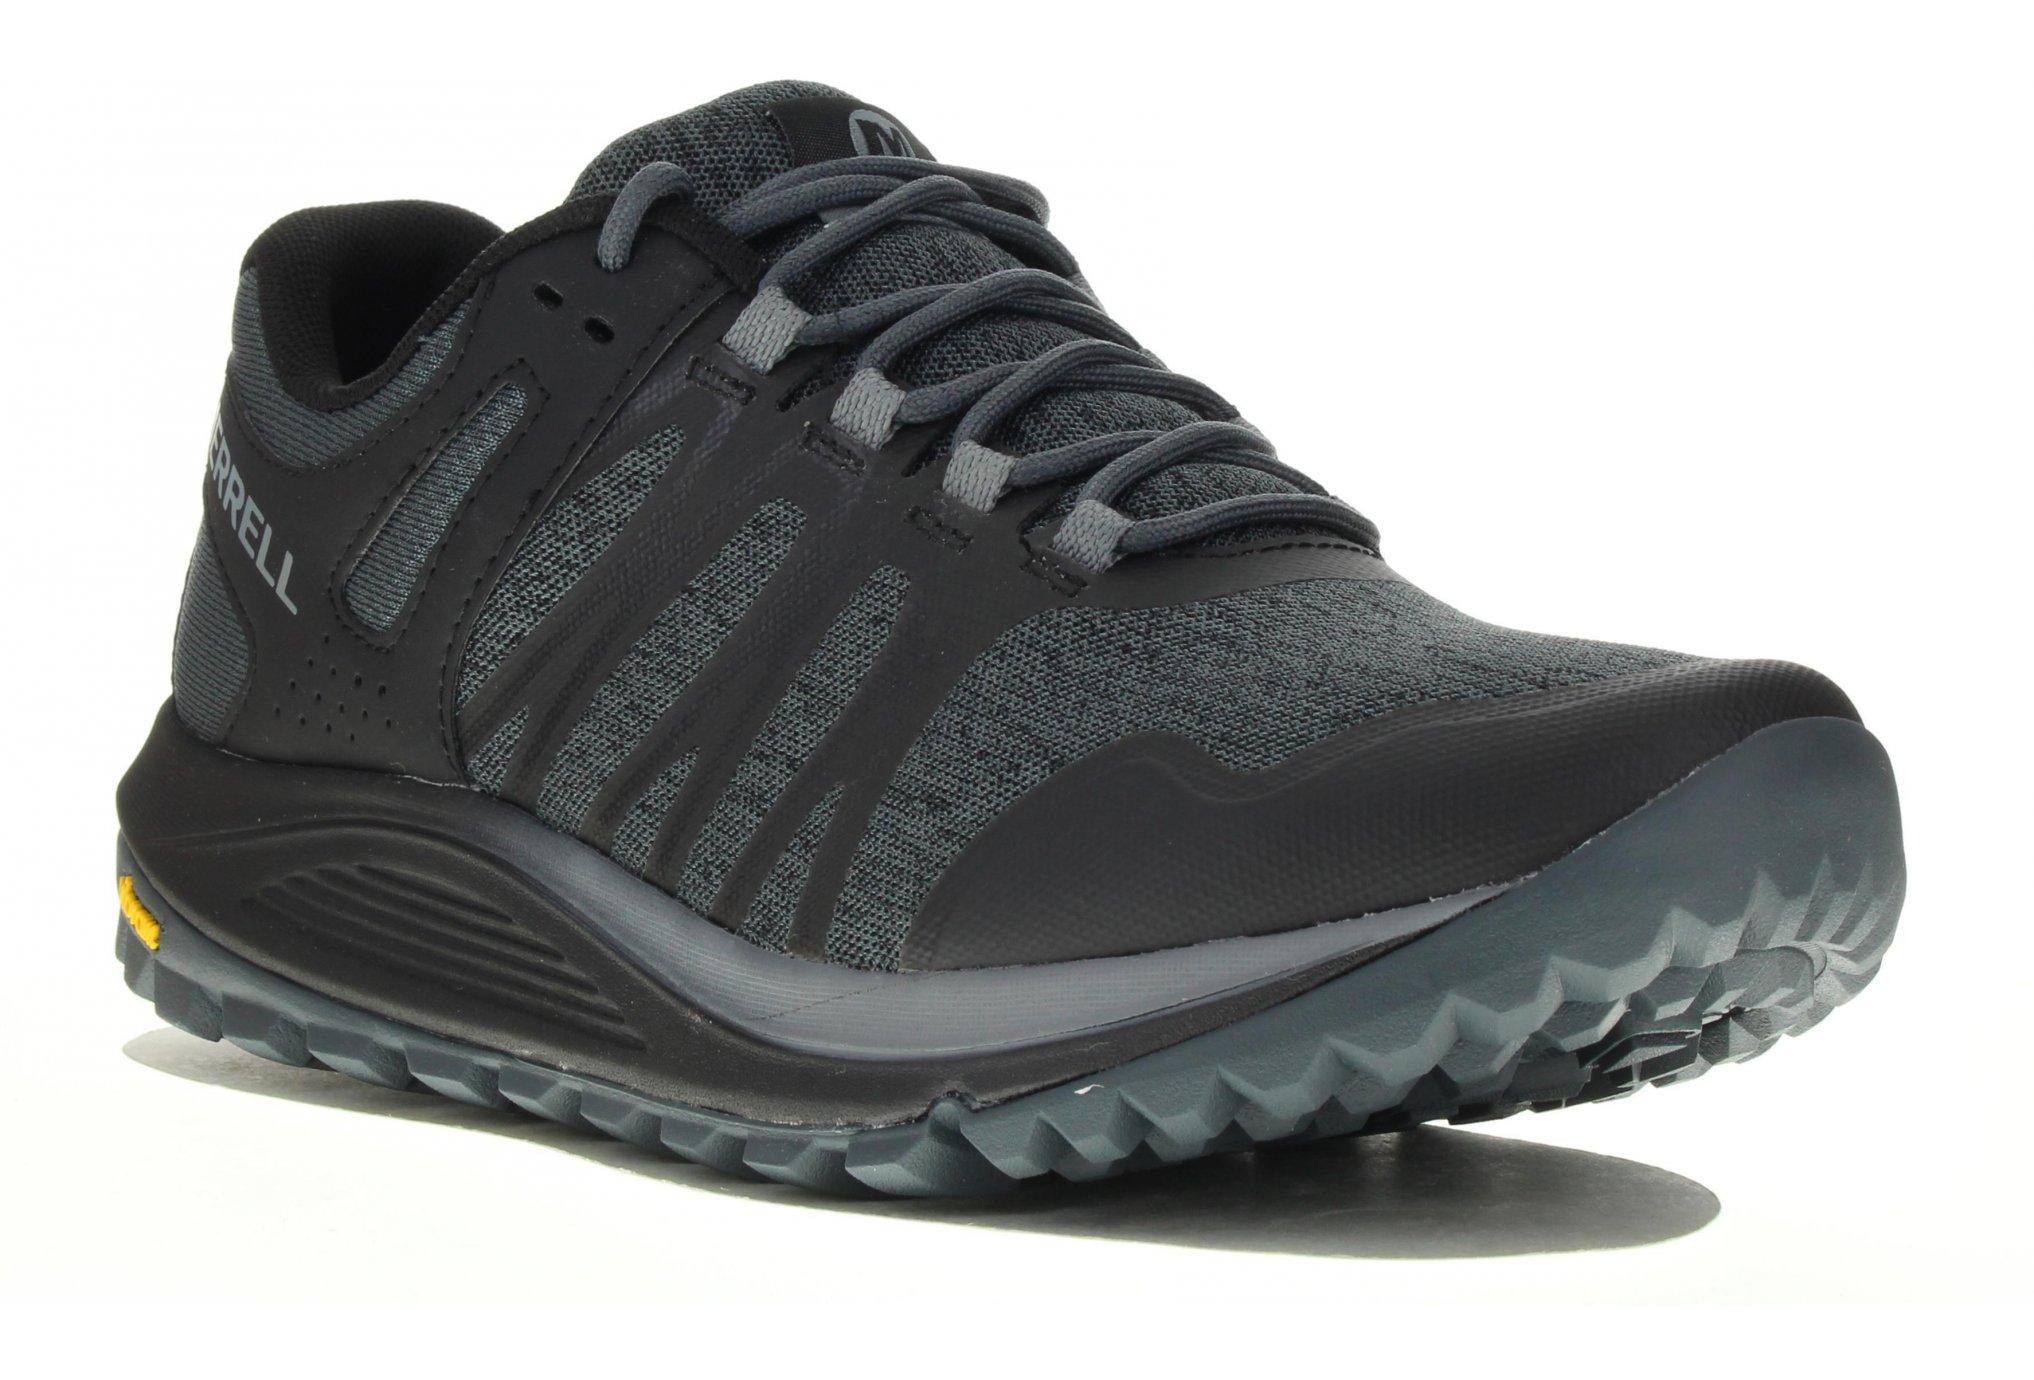 Merrell Nova Chaussures homme